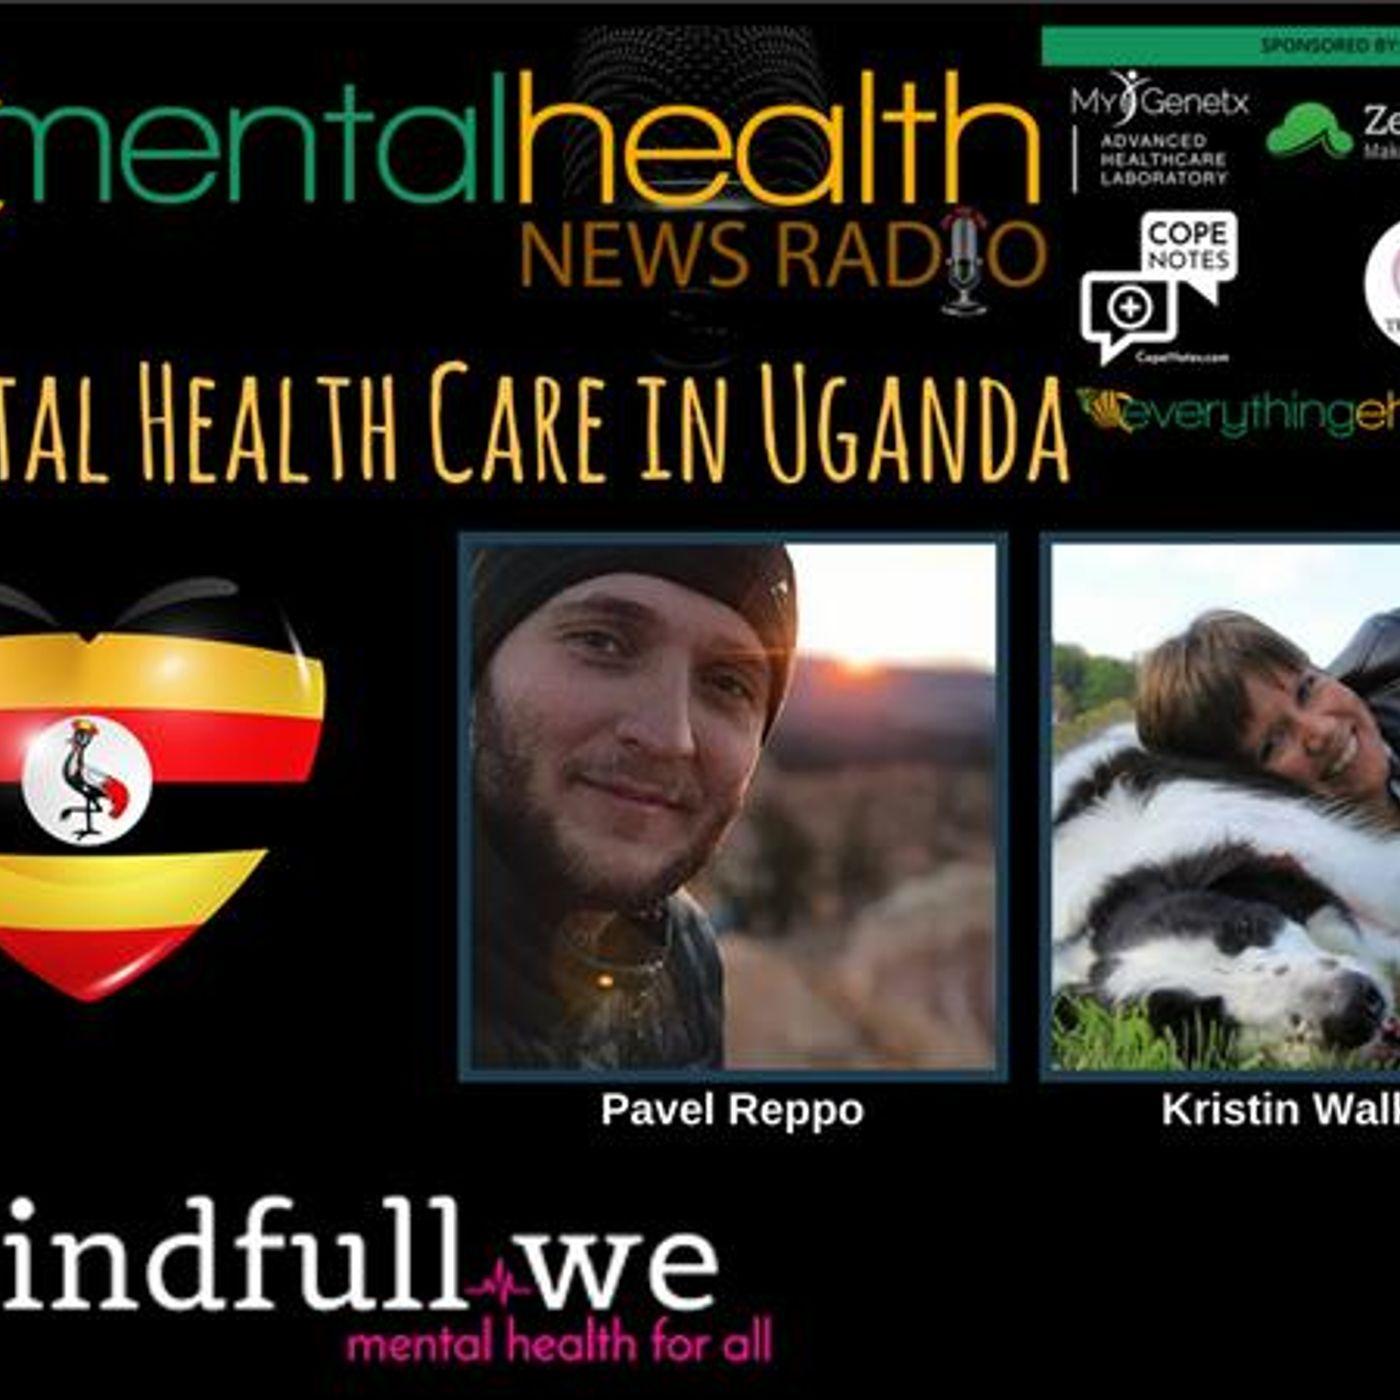 Mental Health News Radio - Mental Health Care in Uganda: Pavel Reppo, CEO MindfullWe.org